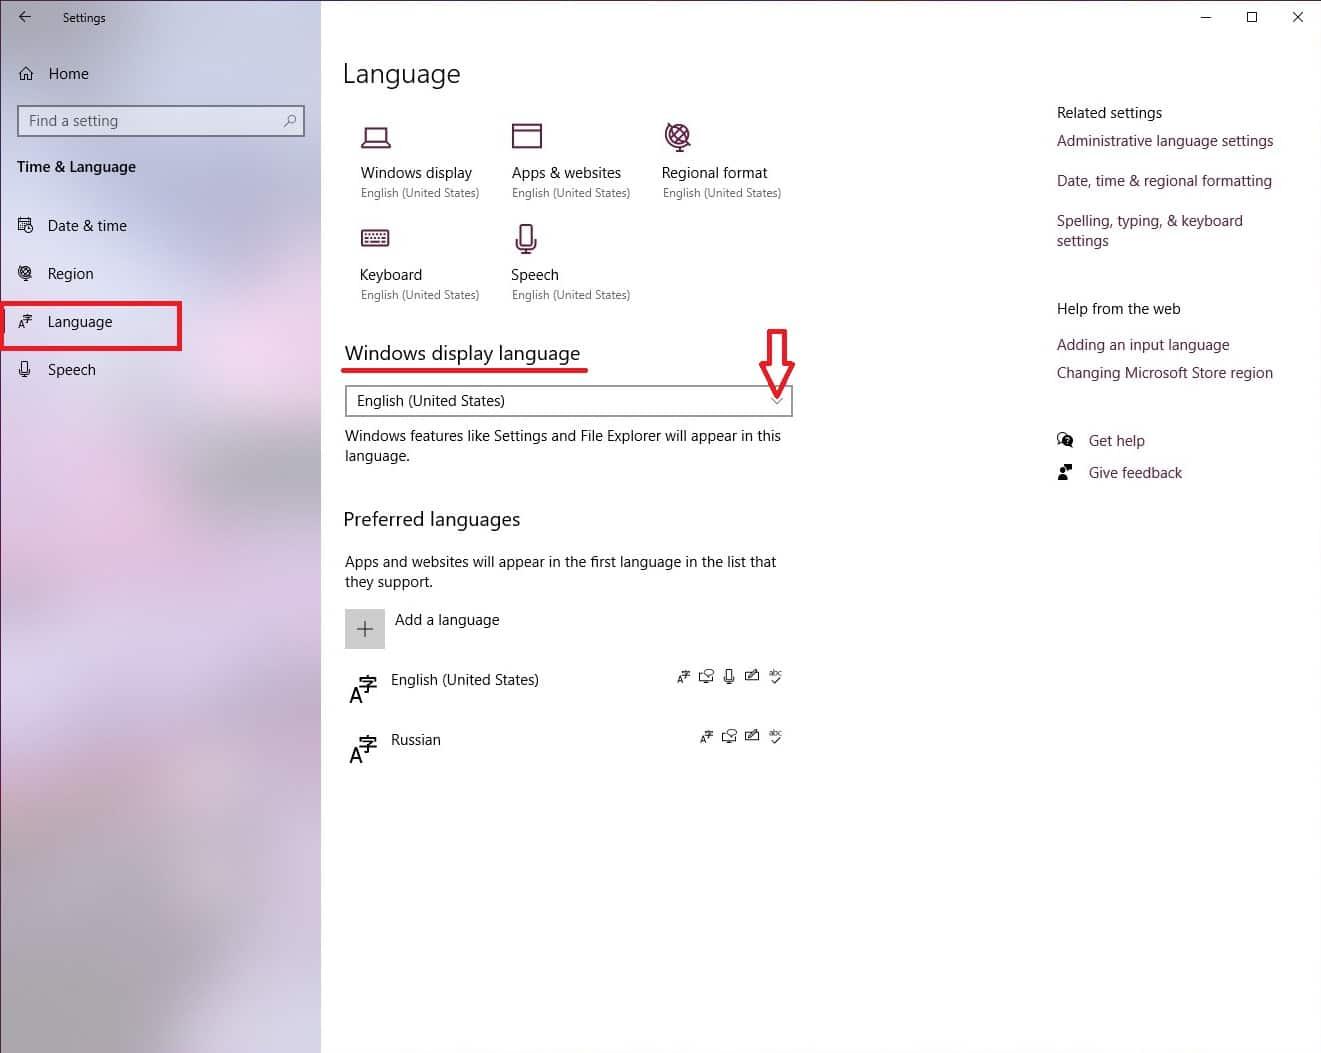 Windows display language